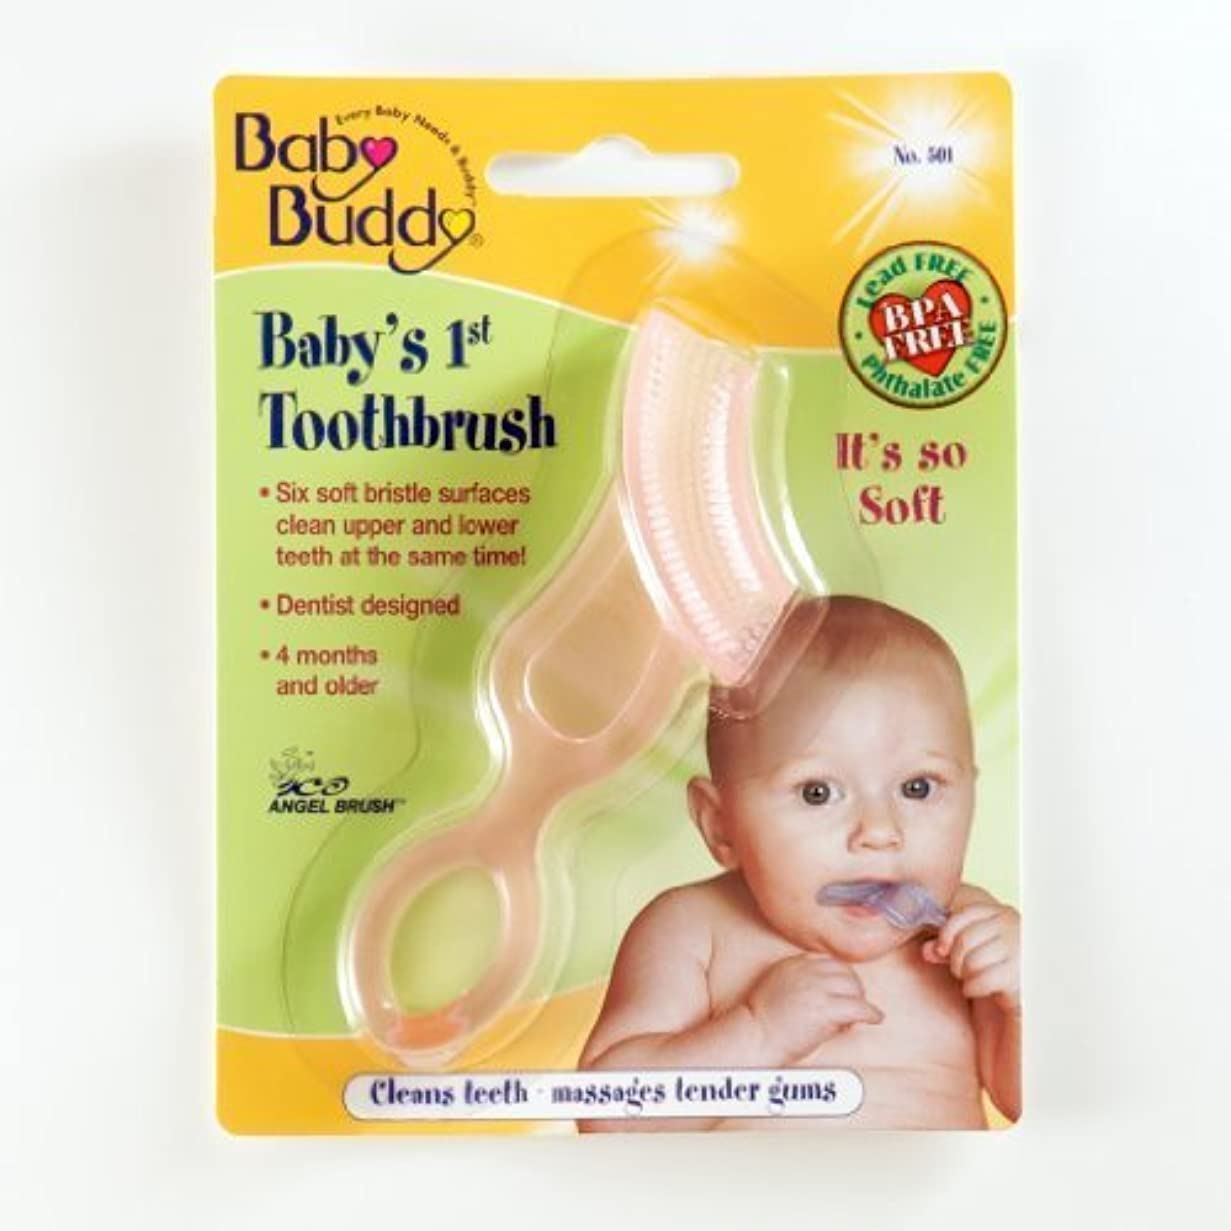 下線小道財団Baby Buddy: Baby's 1st Toothbrush by Baby Buddy [並行輸入品]